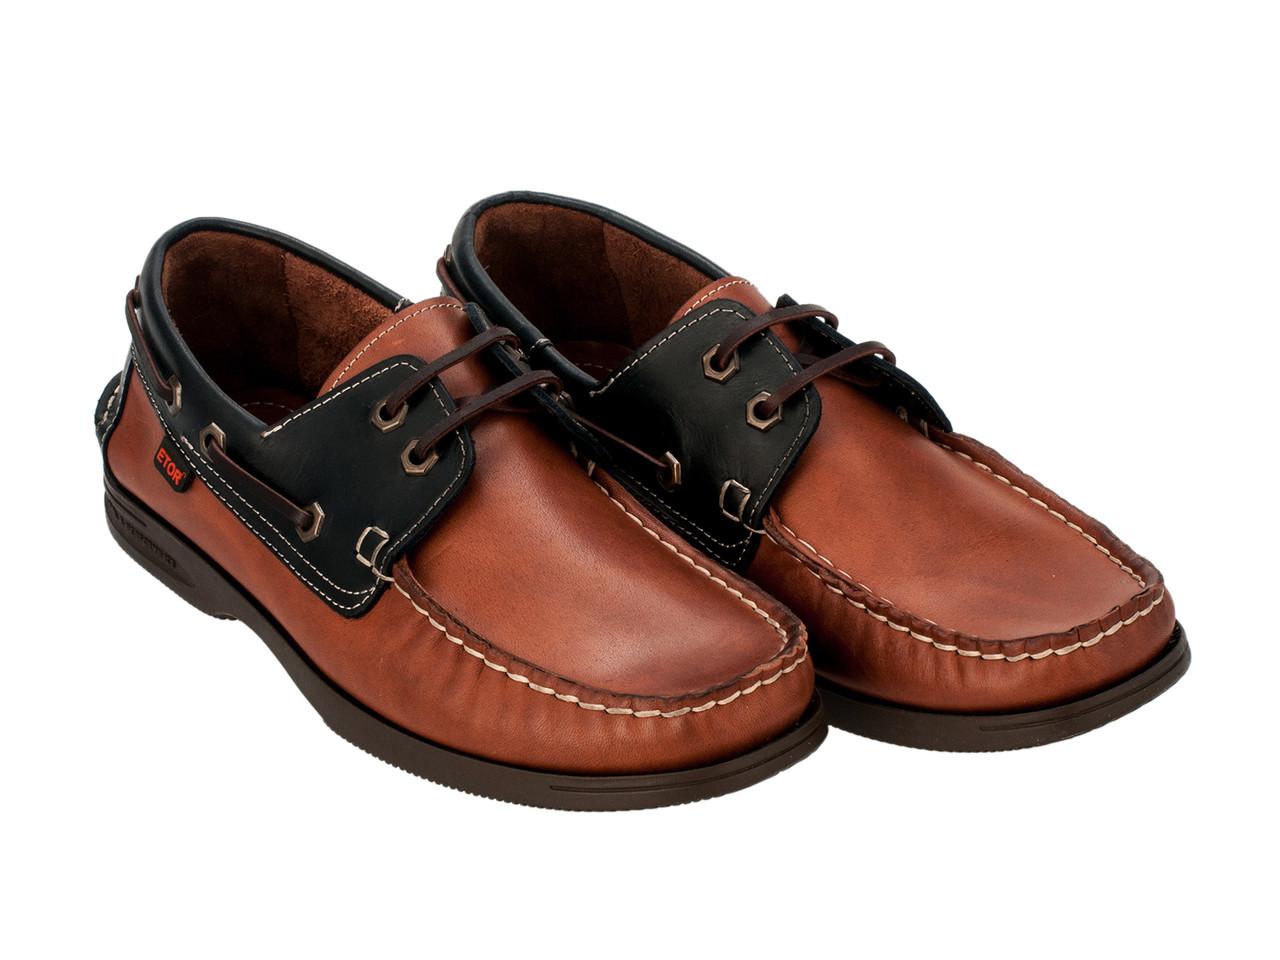 Топ-сайдеры Etor 8066-175-03 коричневые